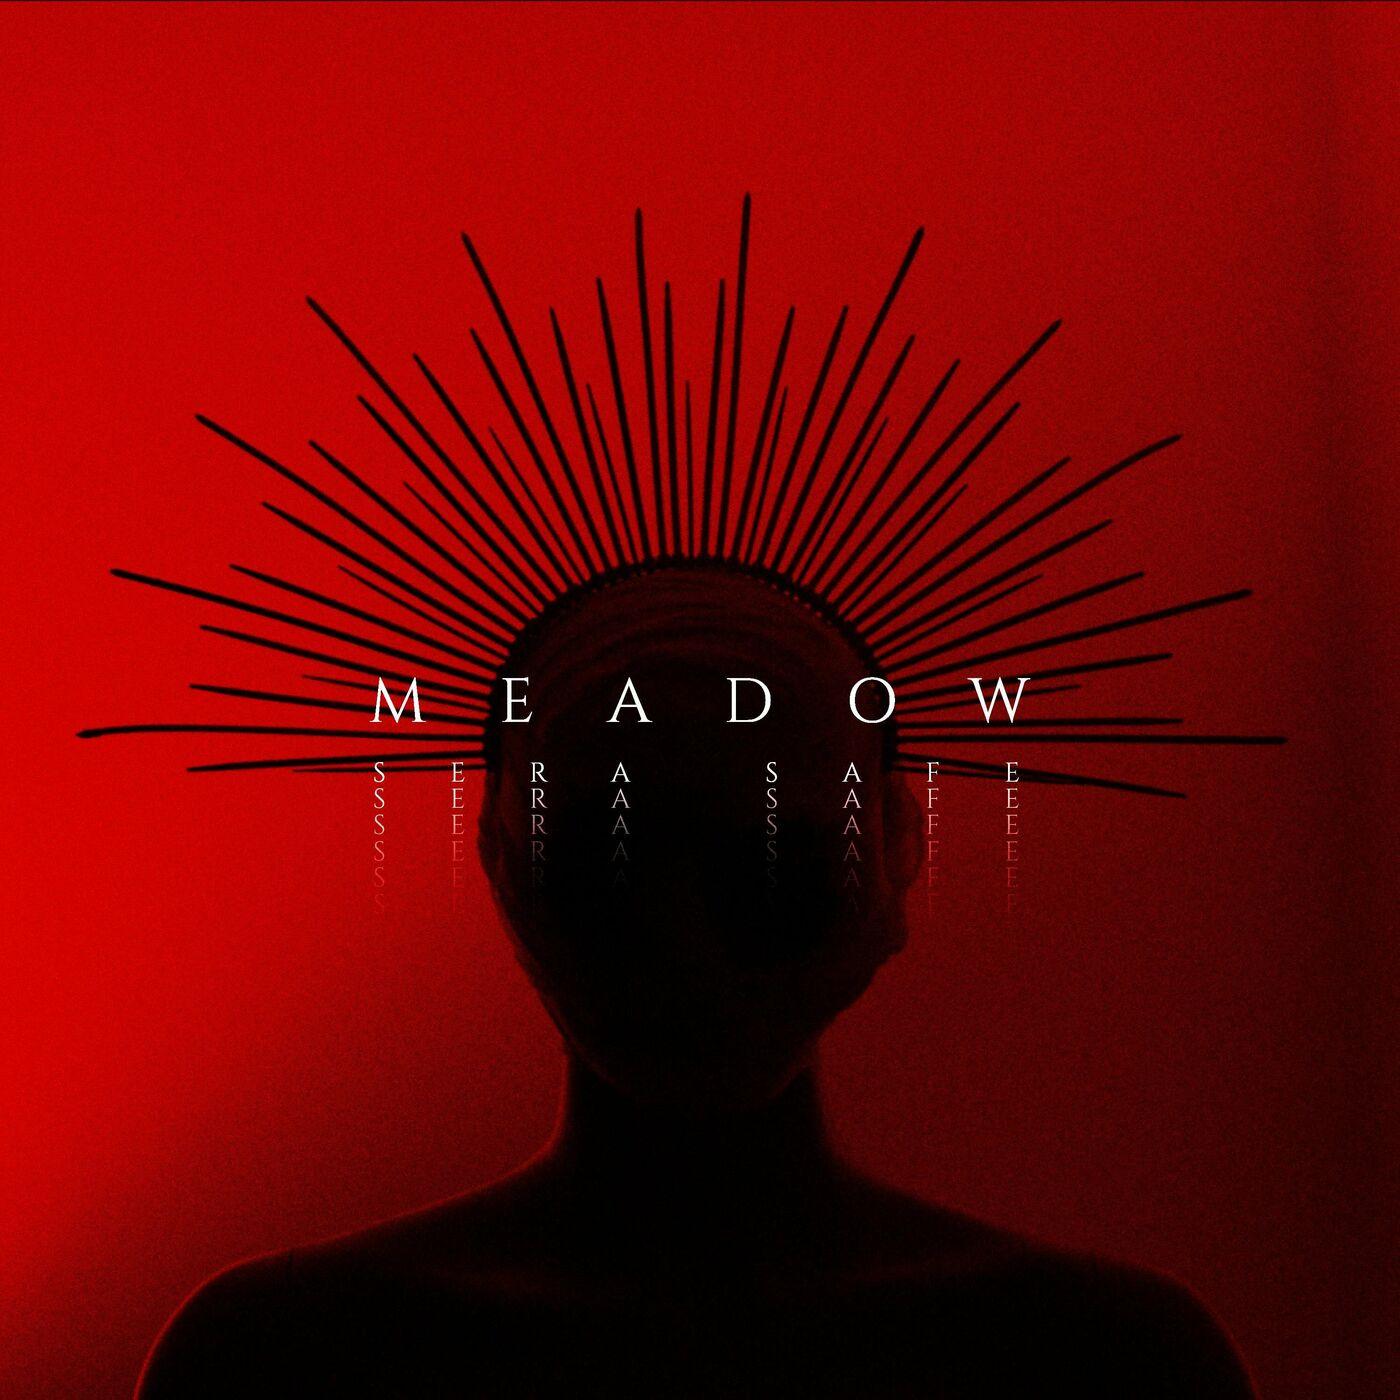 Sera Safe - Meadow [single] (2021)